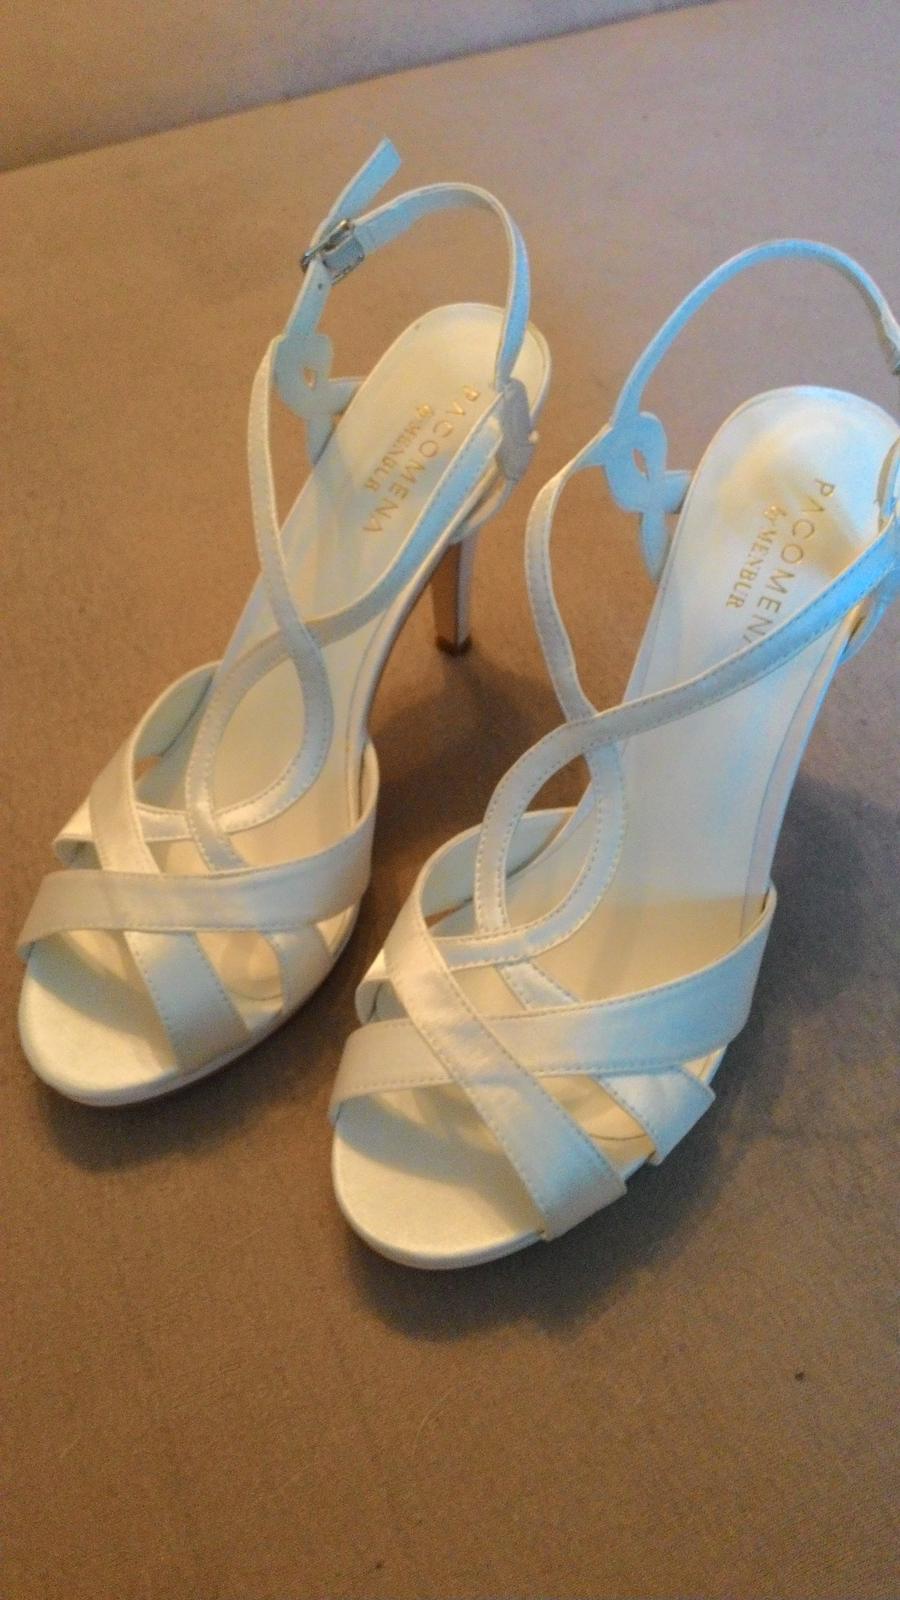 Svadobná priprava - Svad.topánky